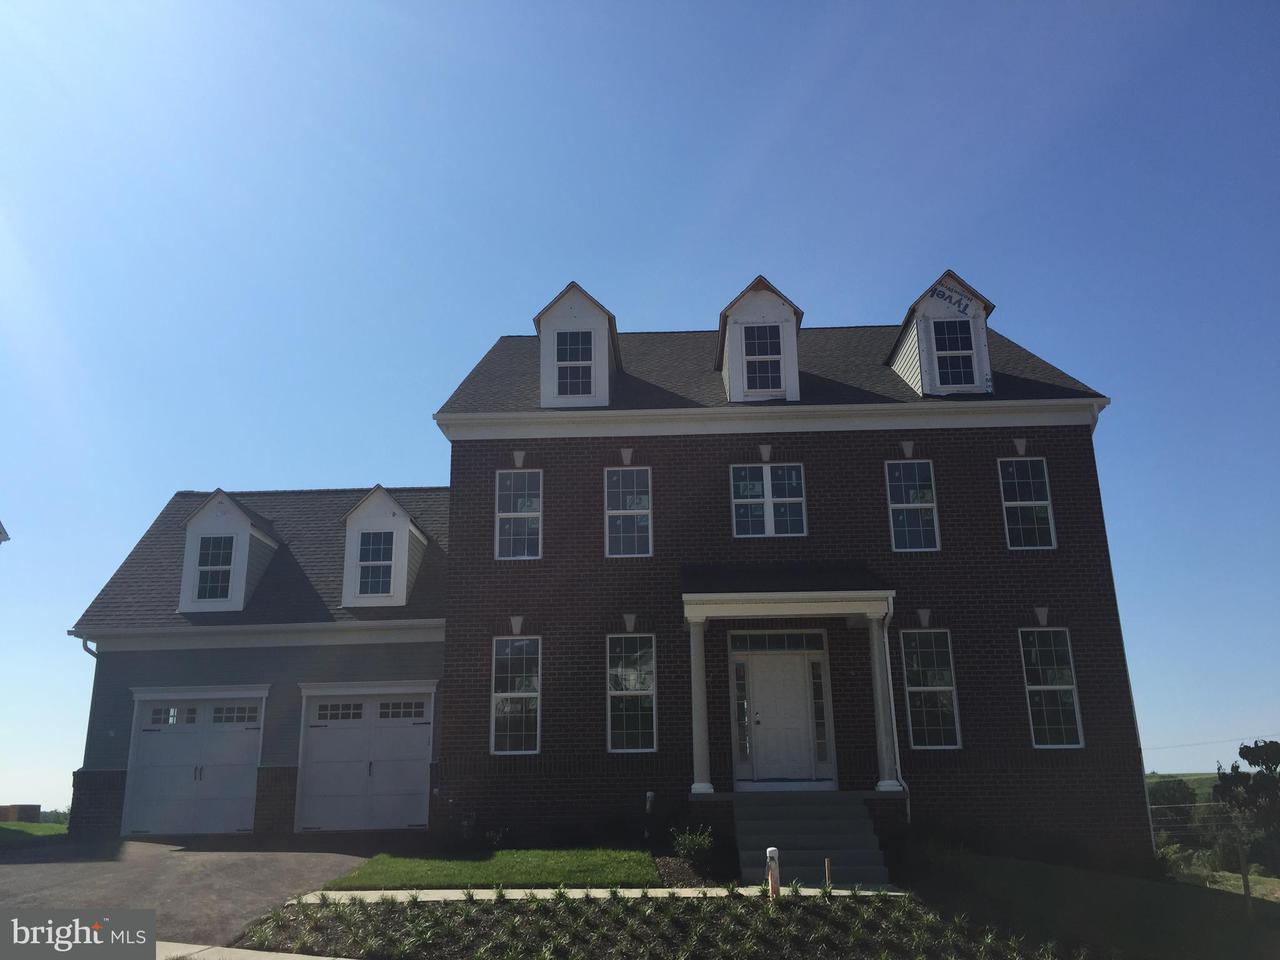 独户住宅 为 销售 在 10803 WHITE TRILLIUM Road 10803 WHITE TRILLIUM Road Perry Hall, 马里兰州 21128 美国